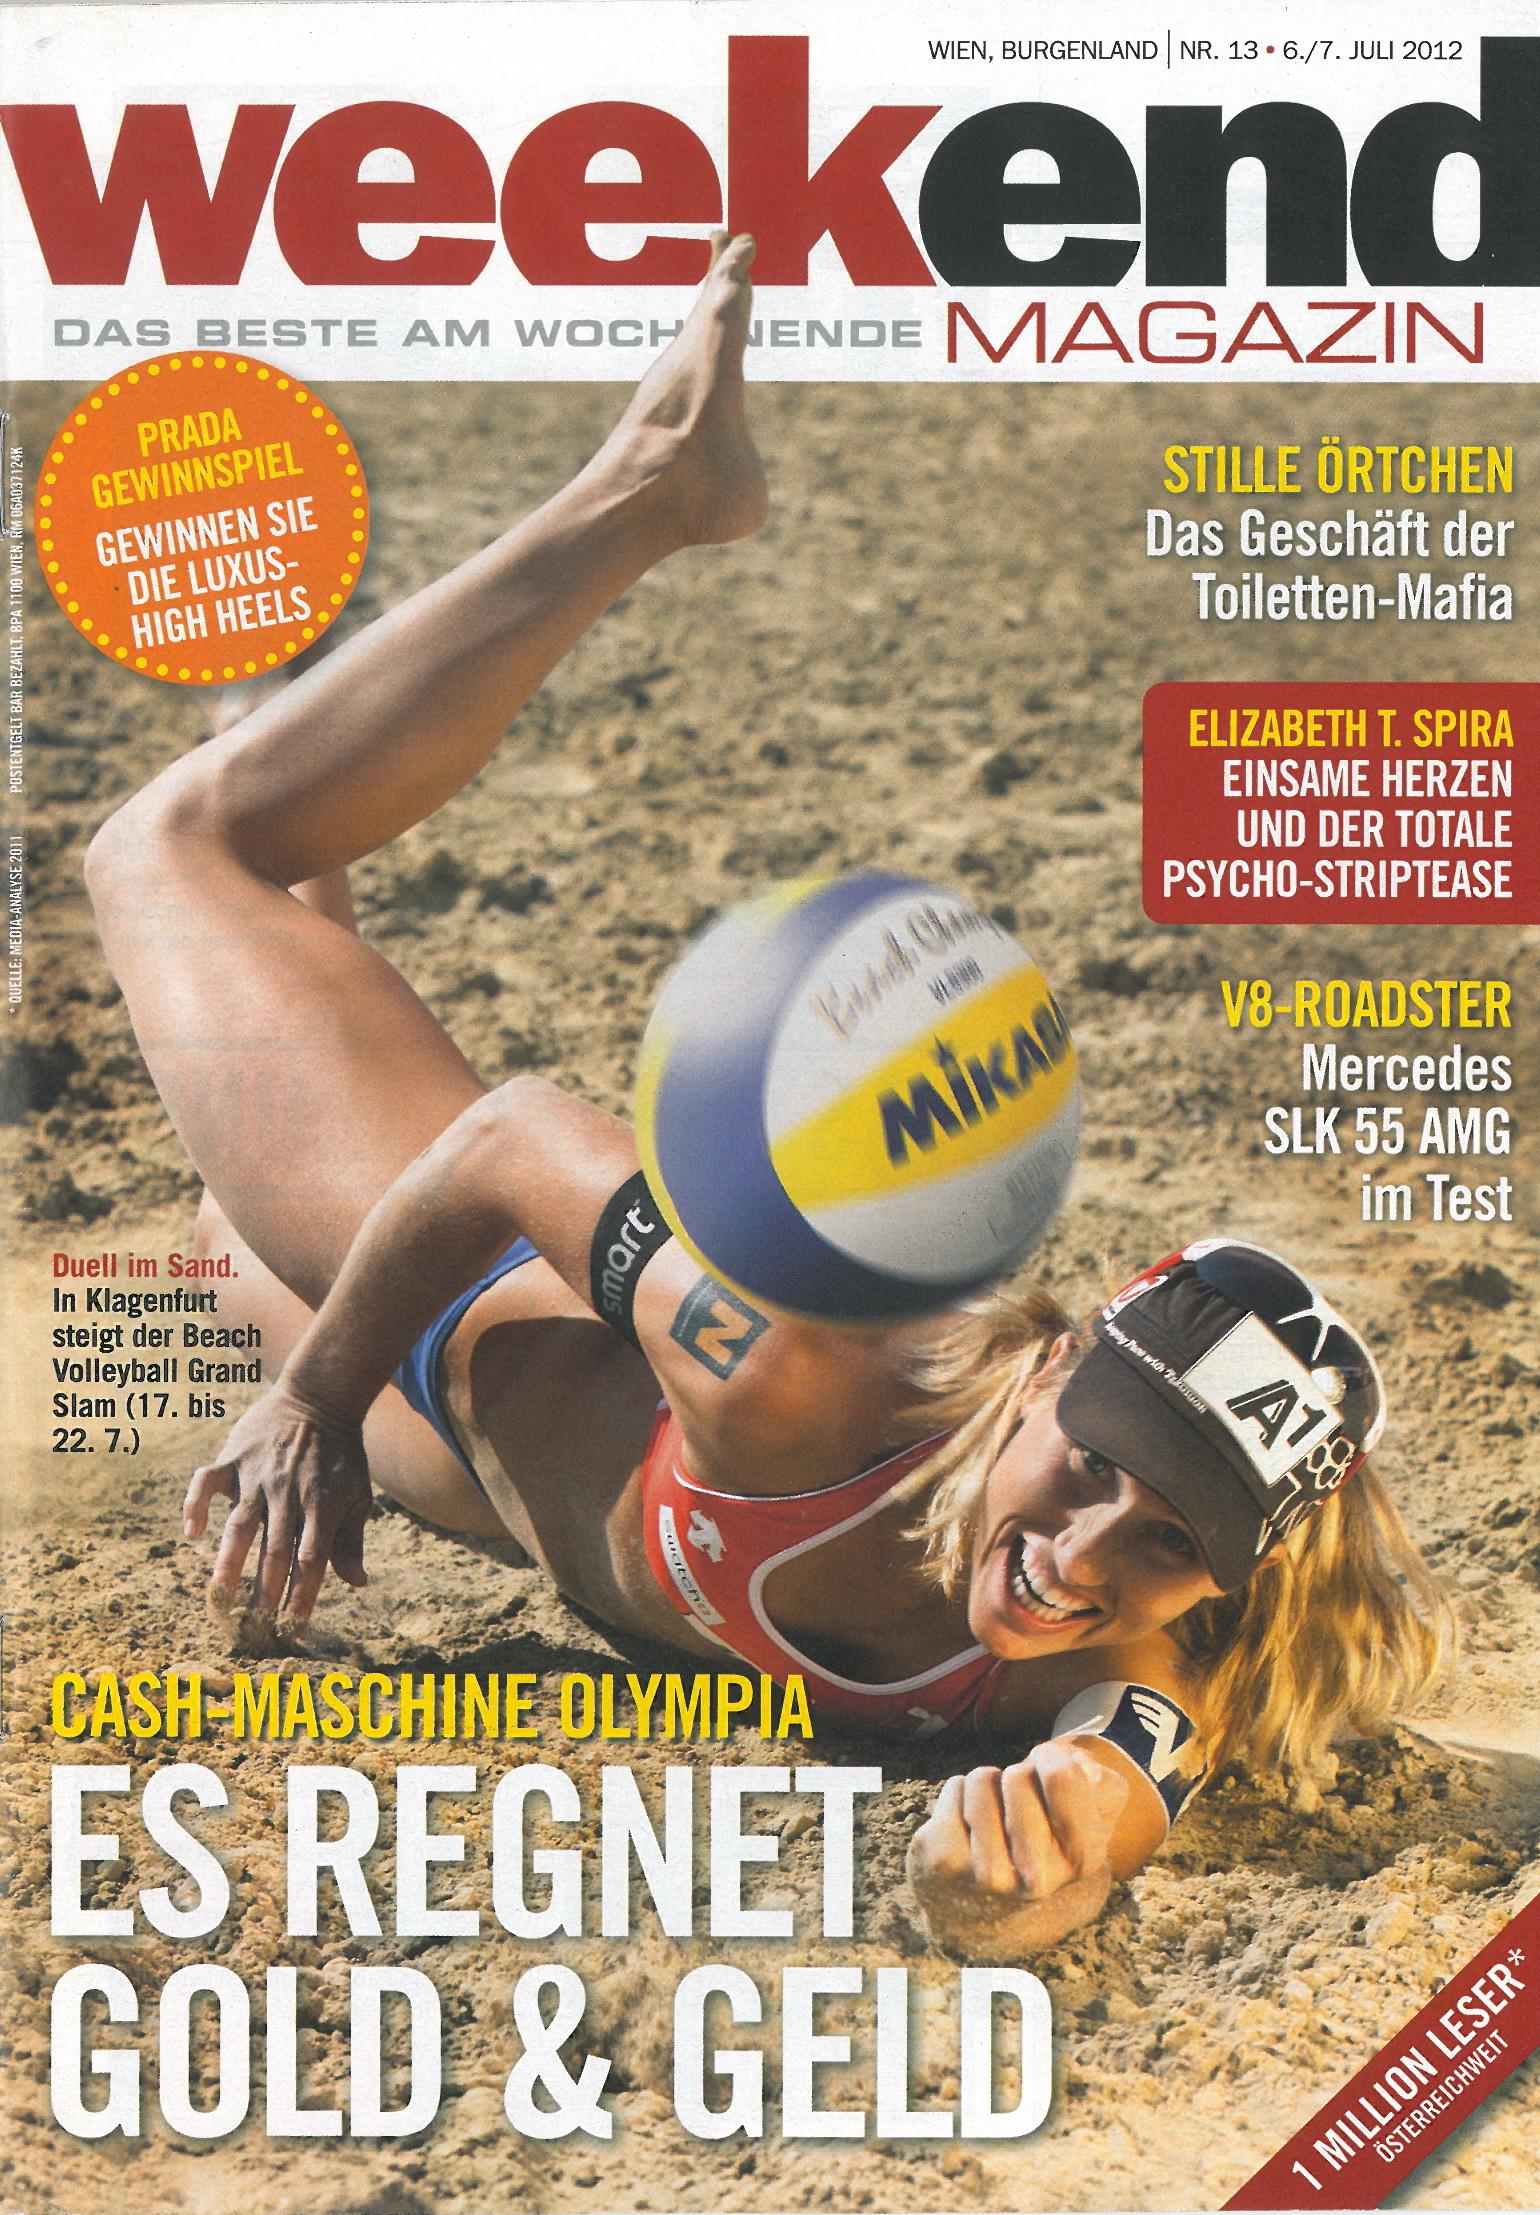 Weekend Magazin_6.Jul.2012_DadeDesign Wave_p1.jpg